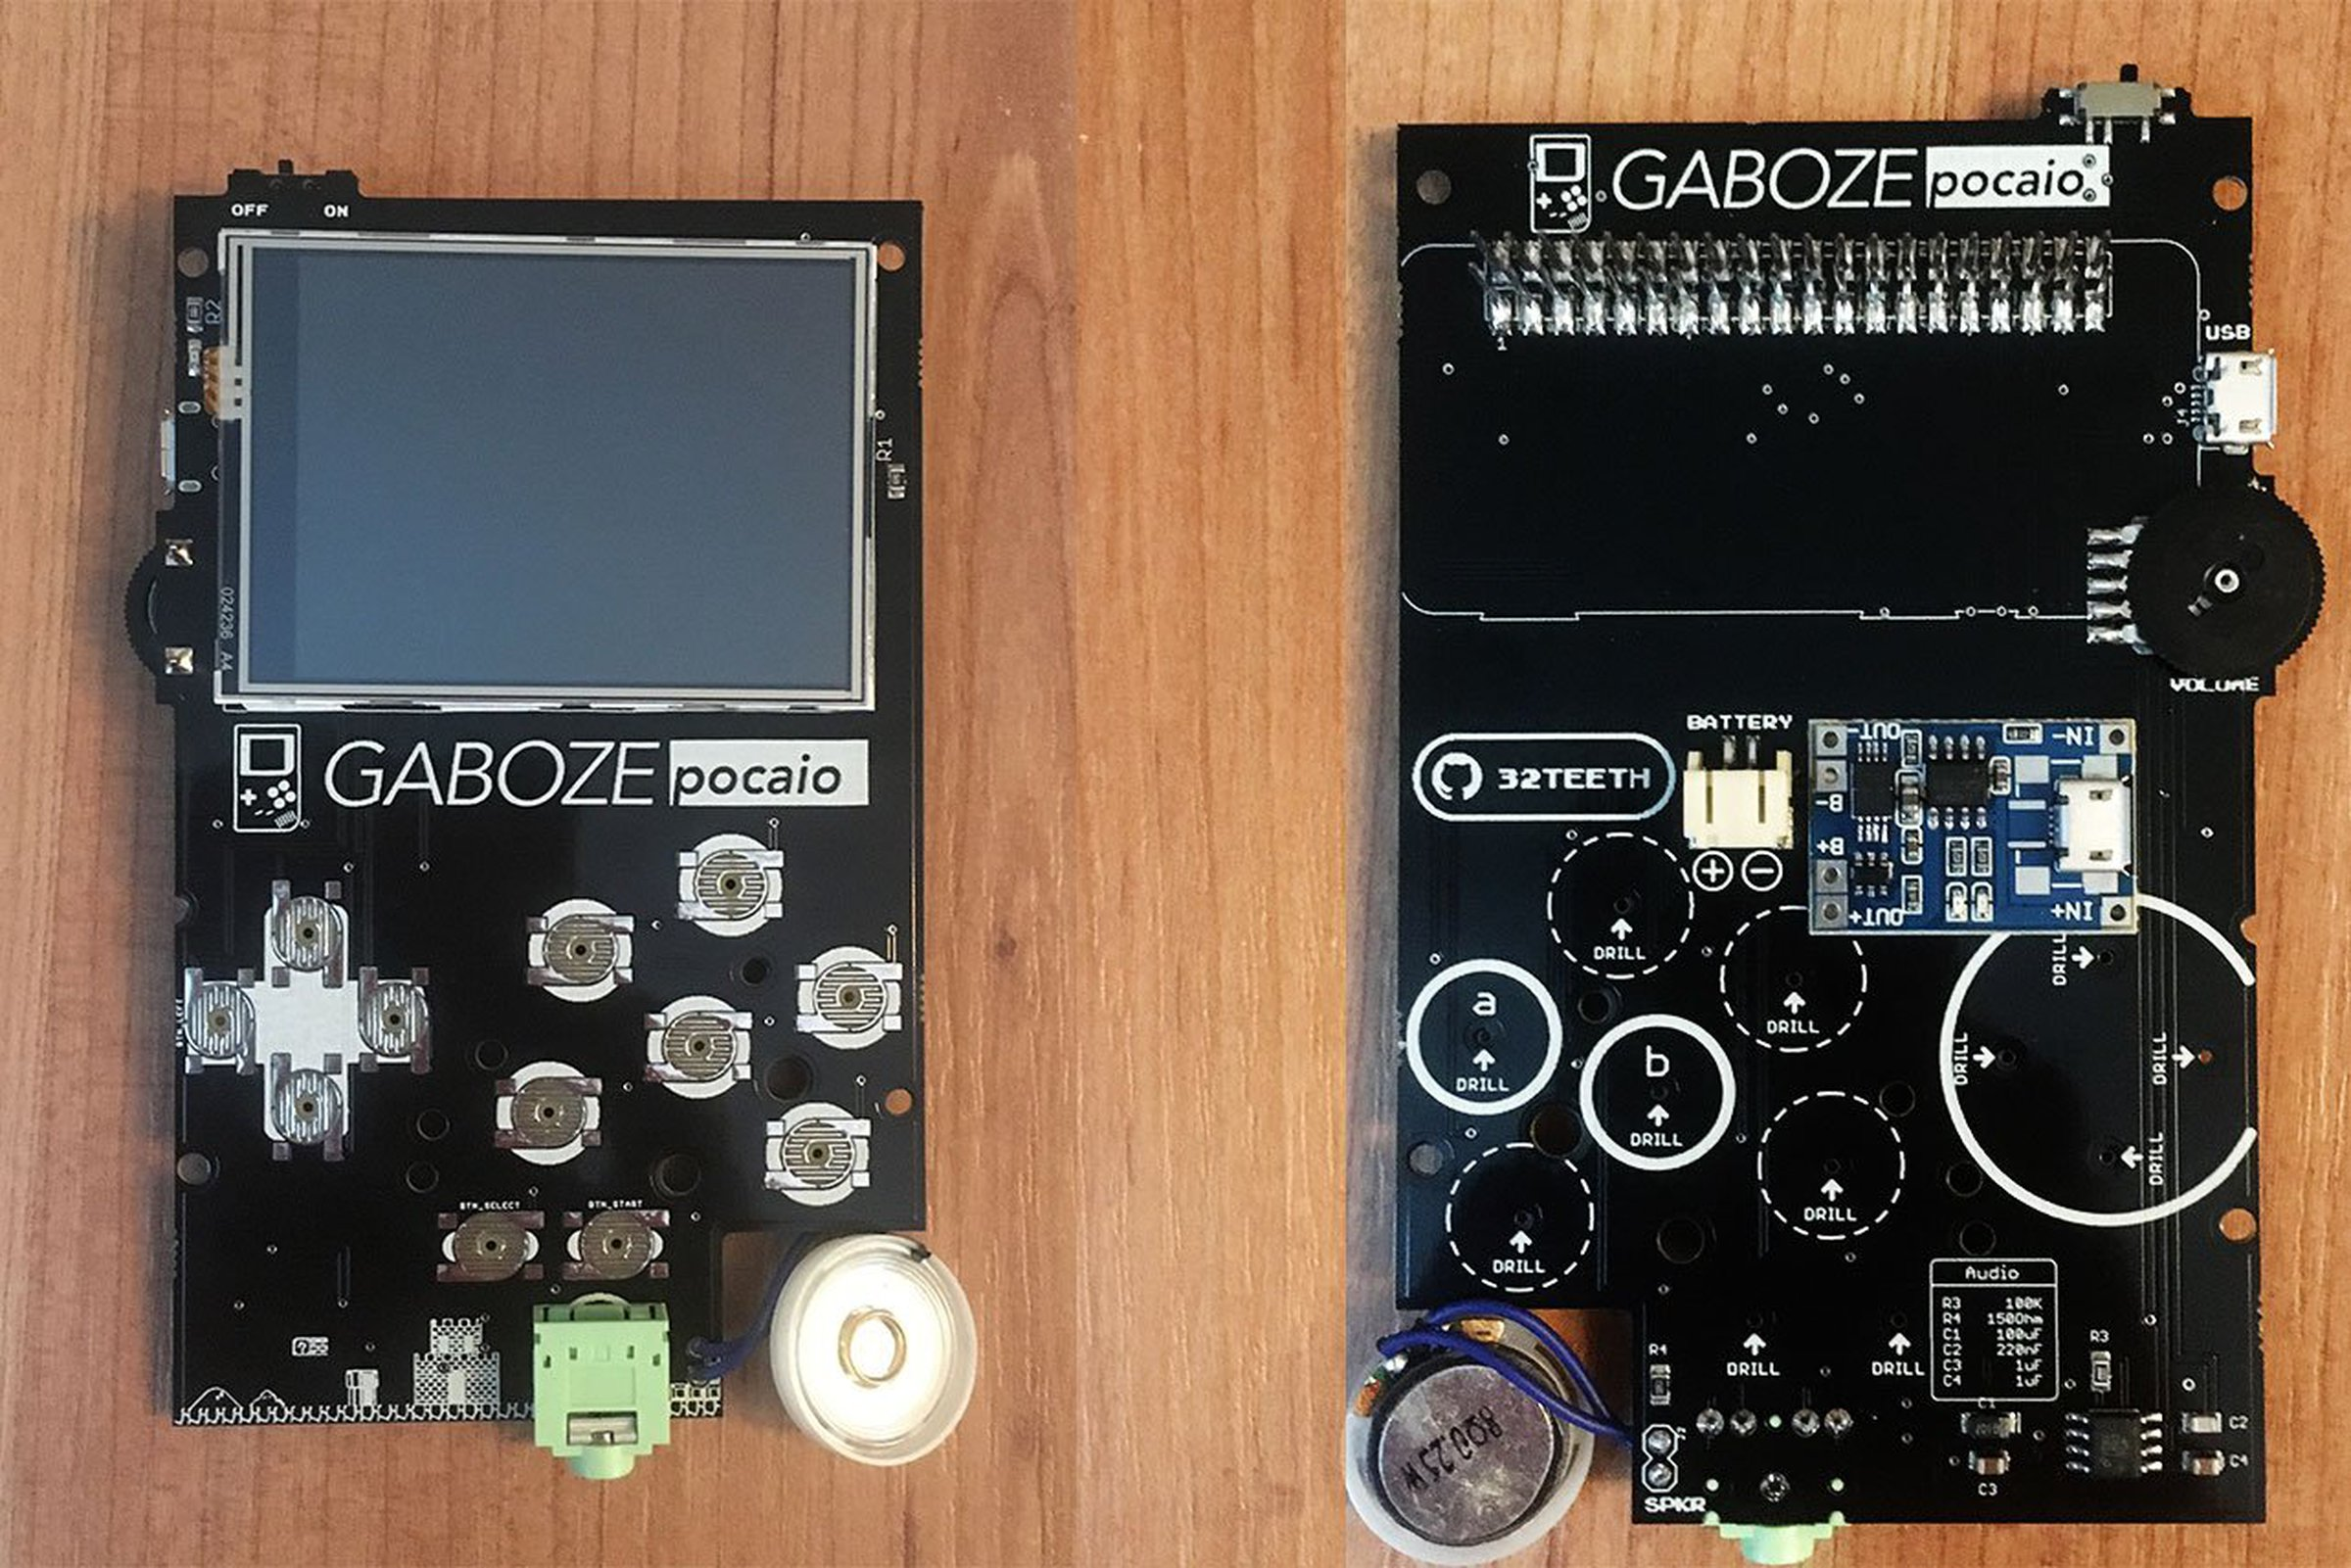 Gaboze Pocaio - Game Boy Pocket All In One - sudomod